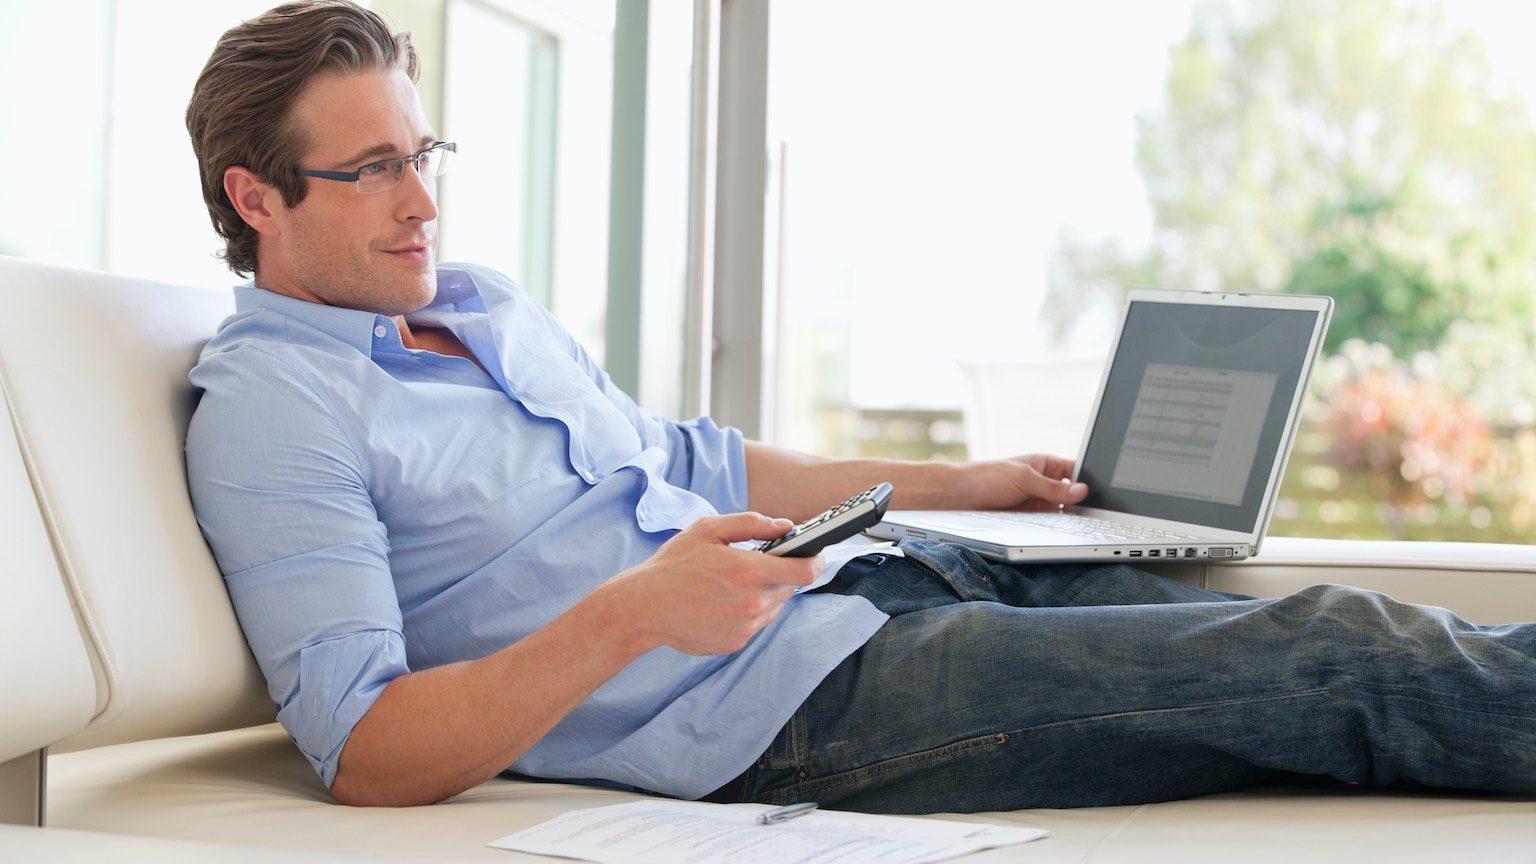 Man watching TV while working on his laptop